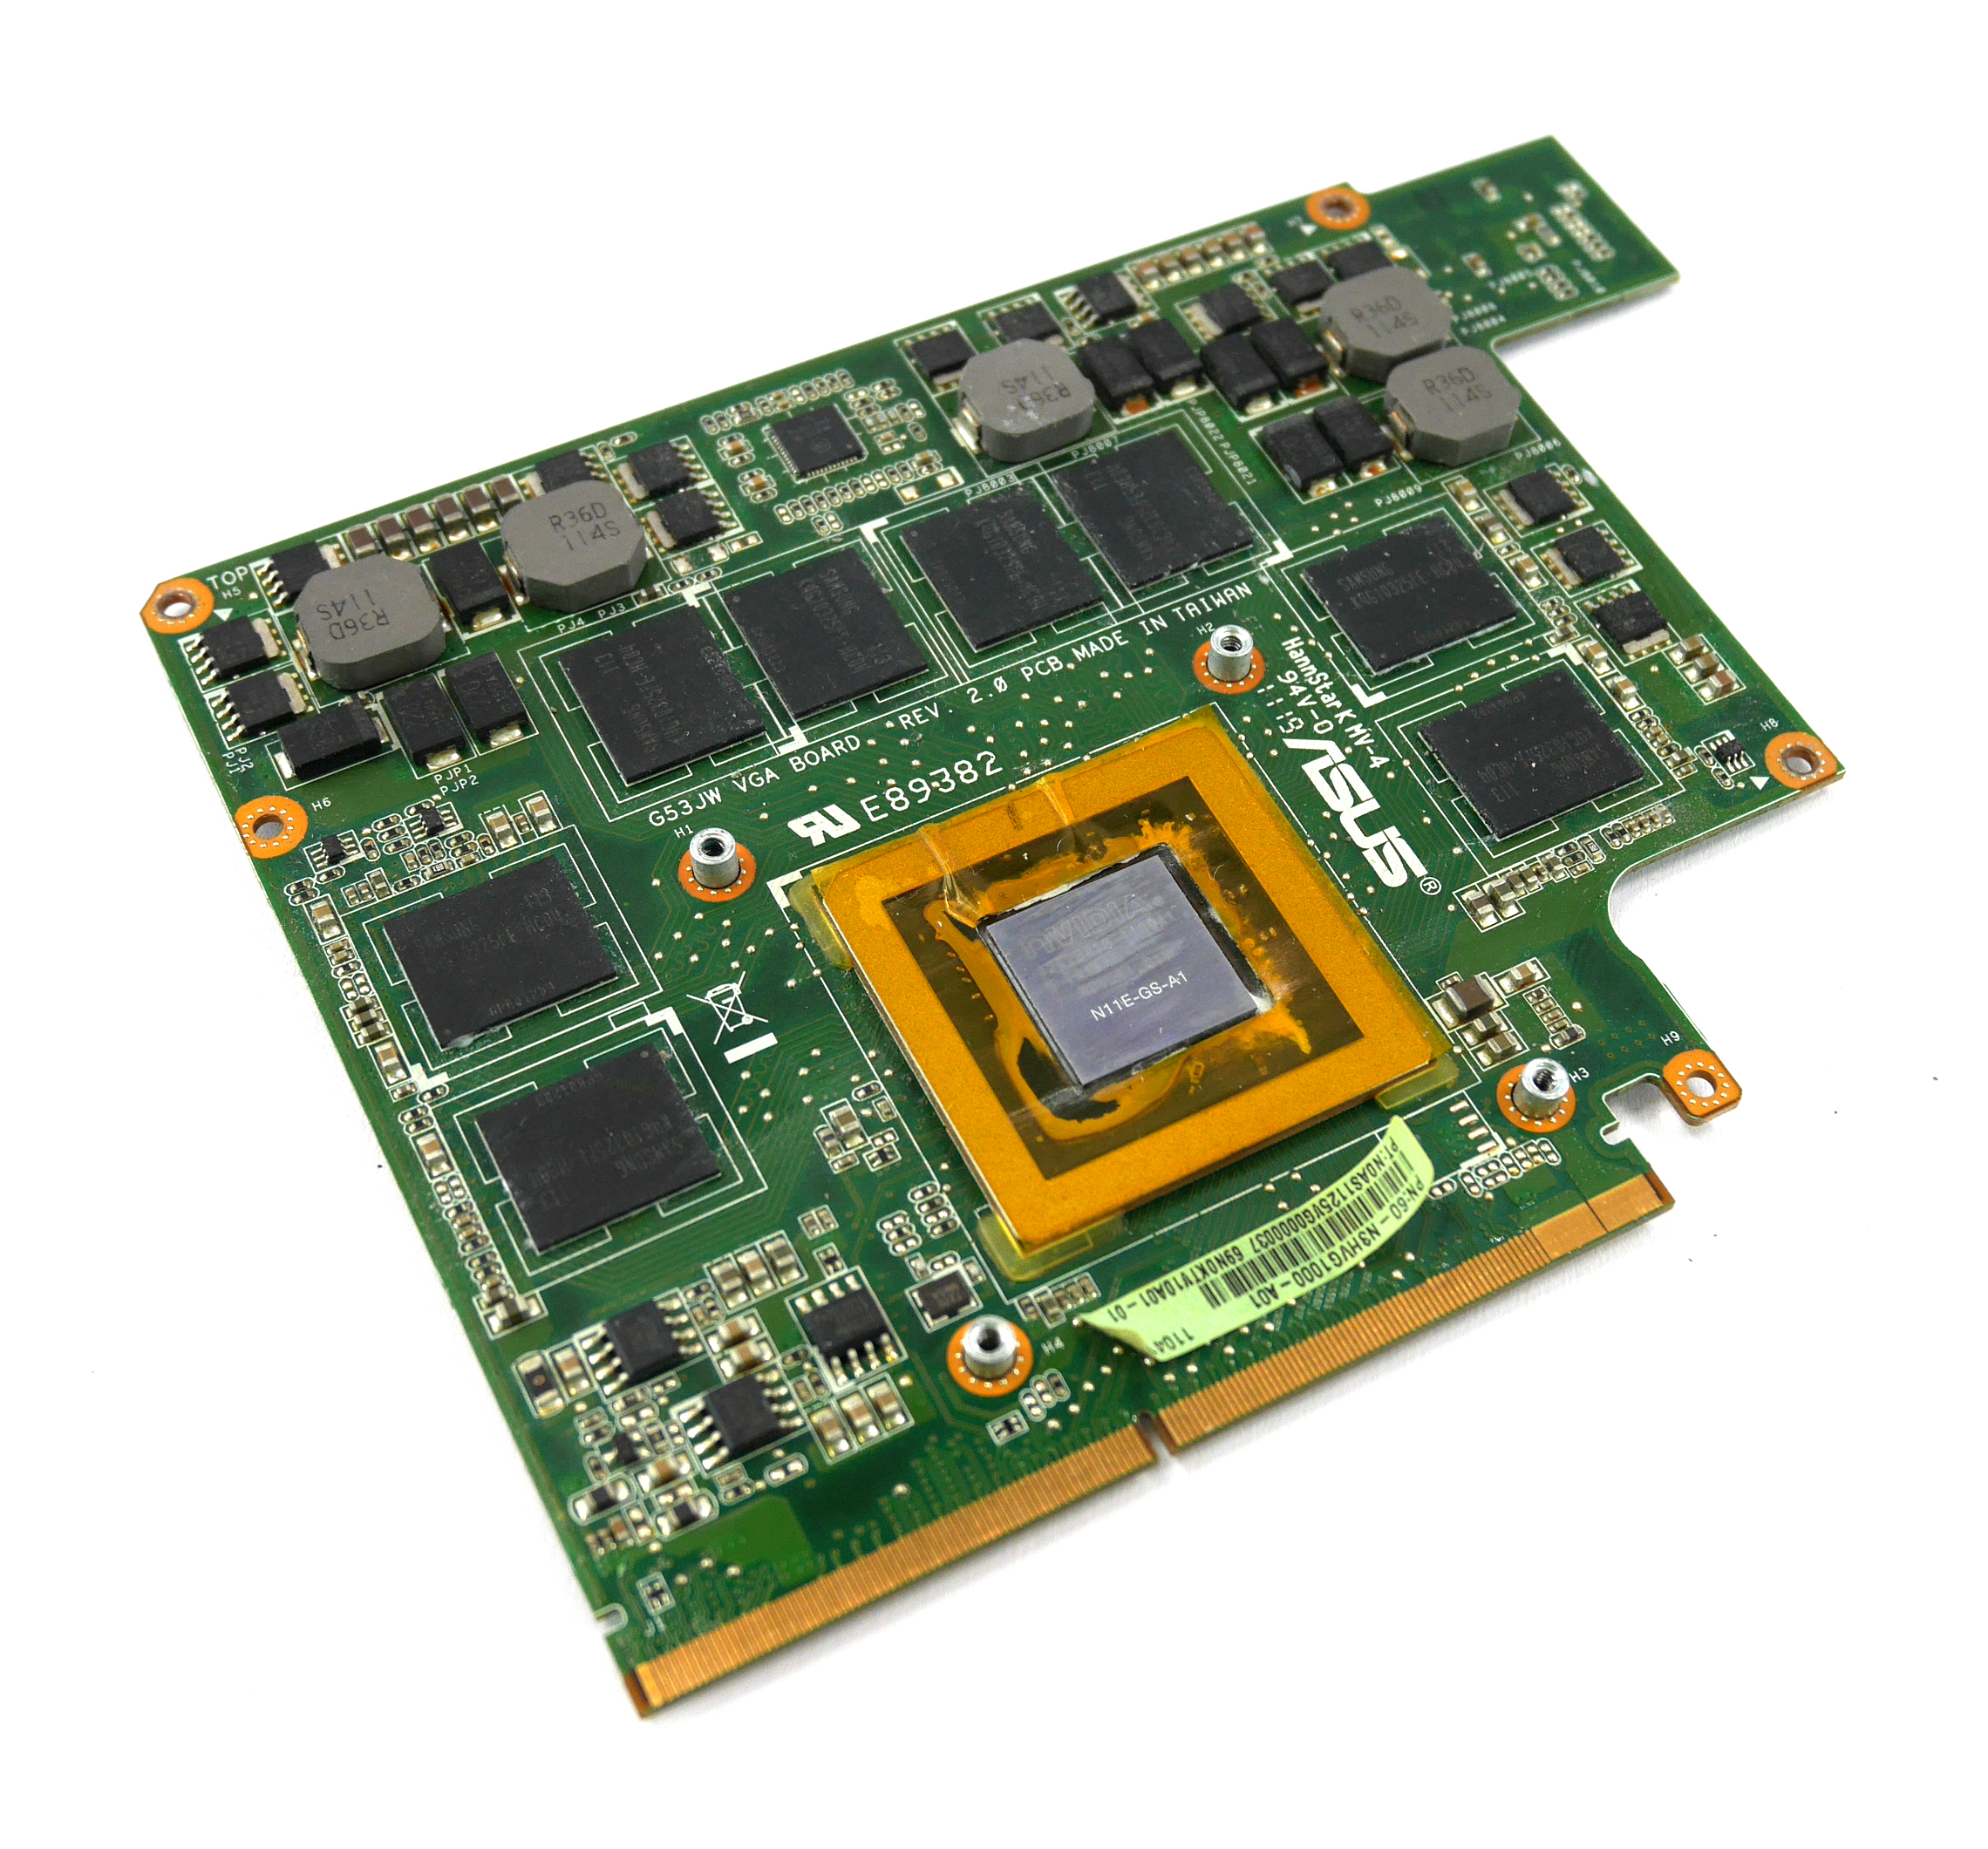 60-N3HVG1000-A01 Asus G53S ROG GTX 460M 1.5GB Graphics Card